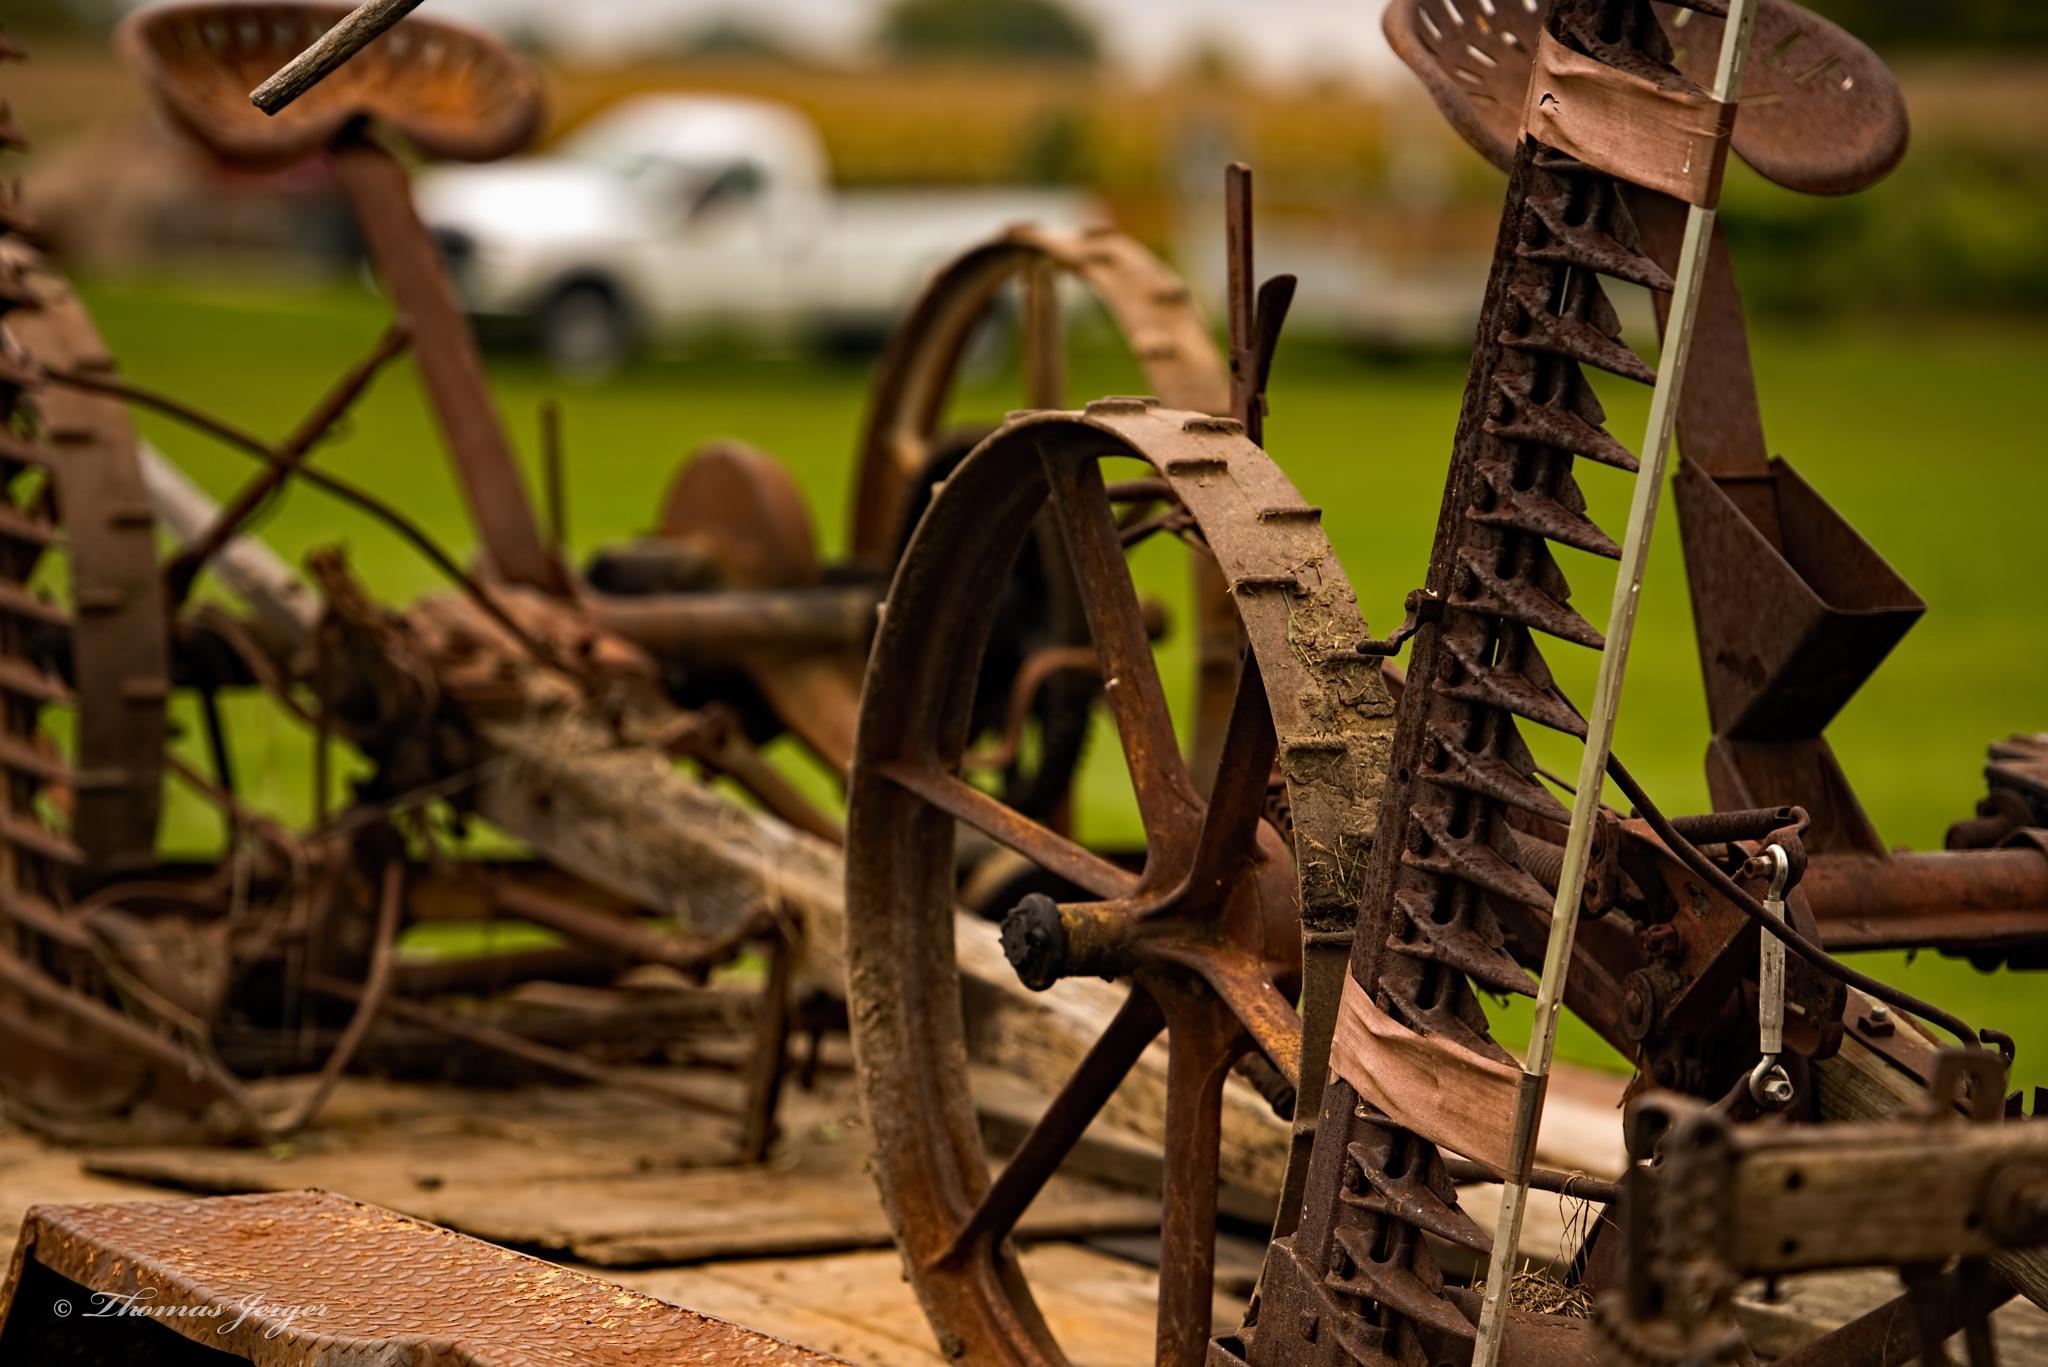 Farm Equipment 0924 by ThomasJerger